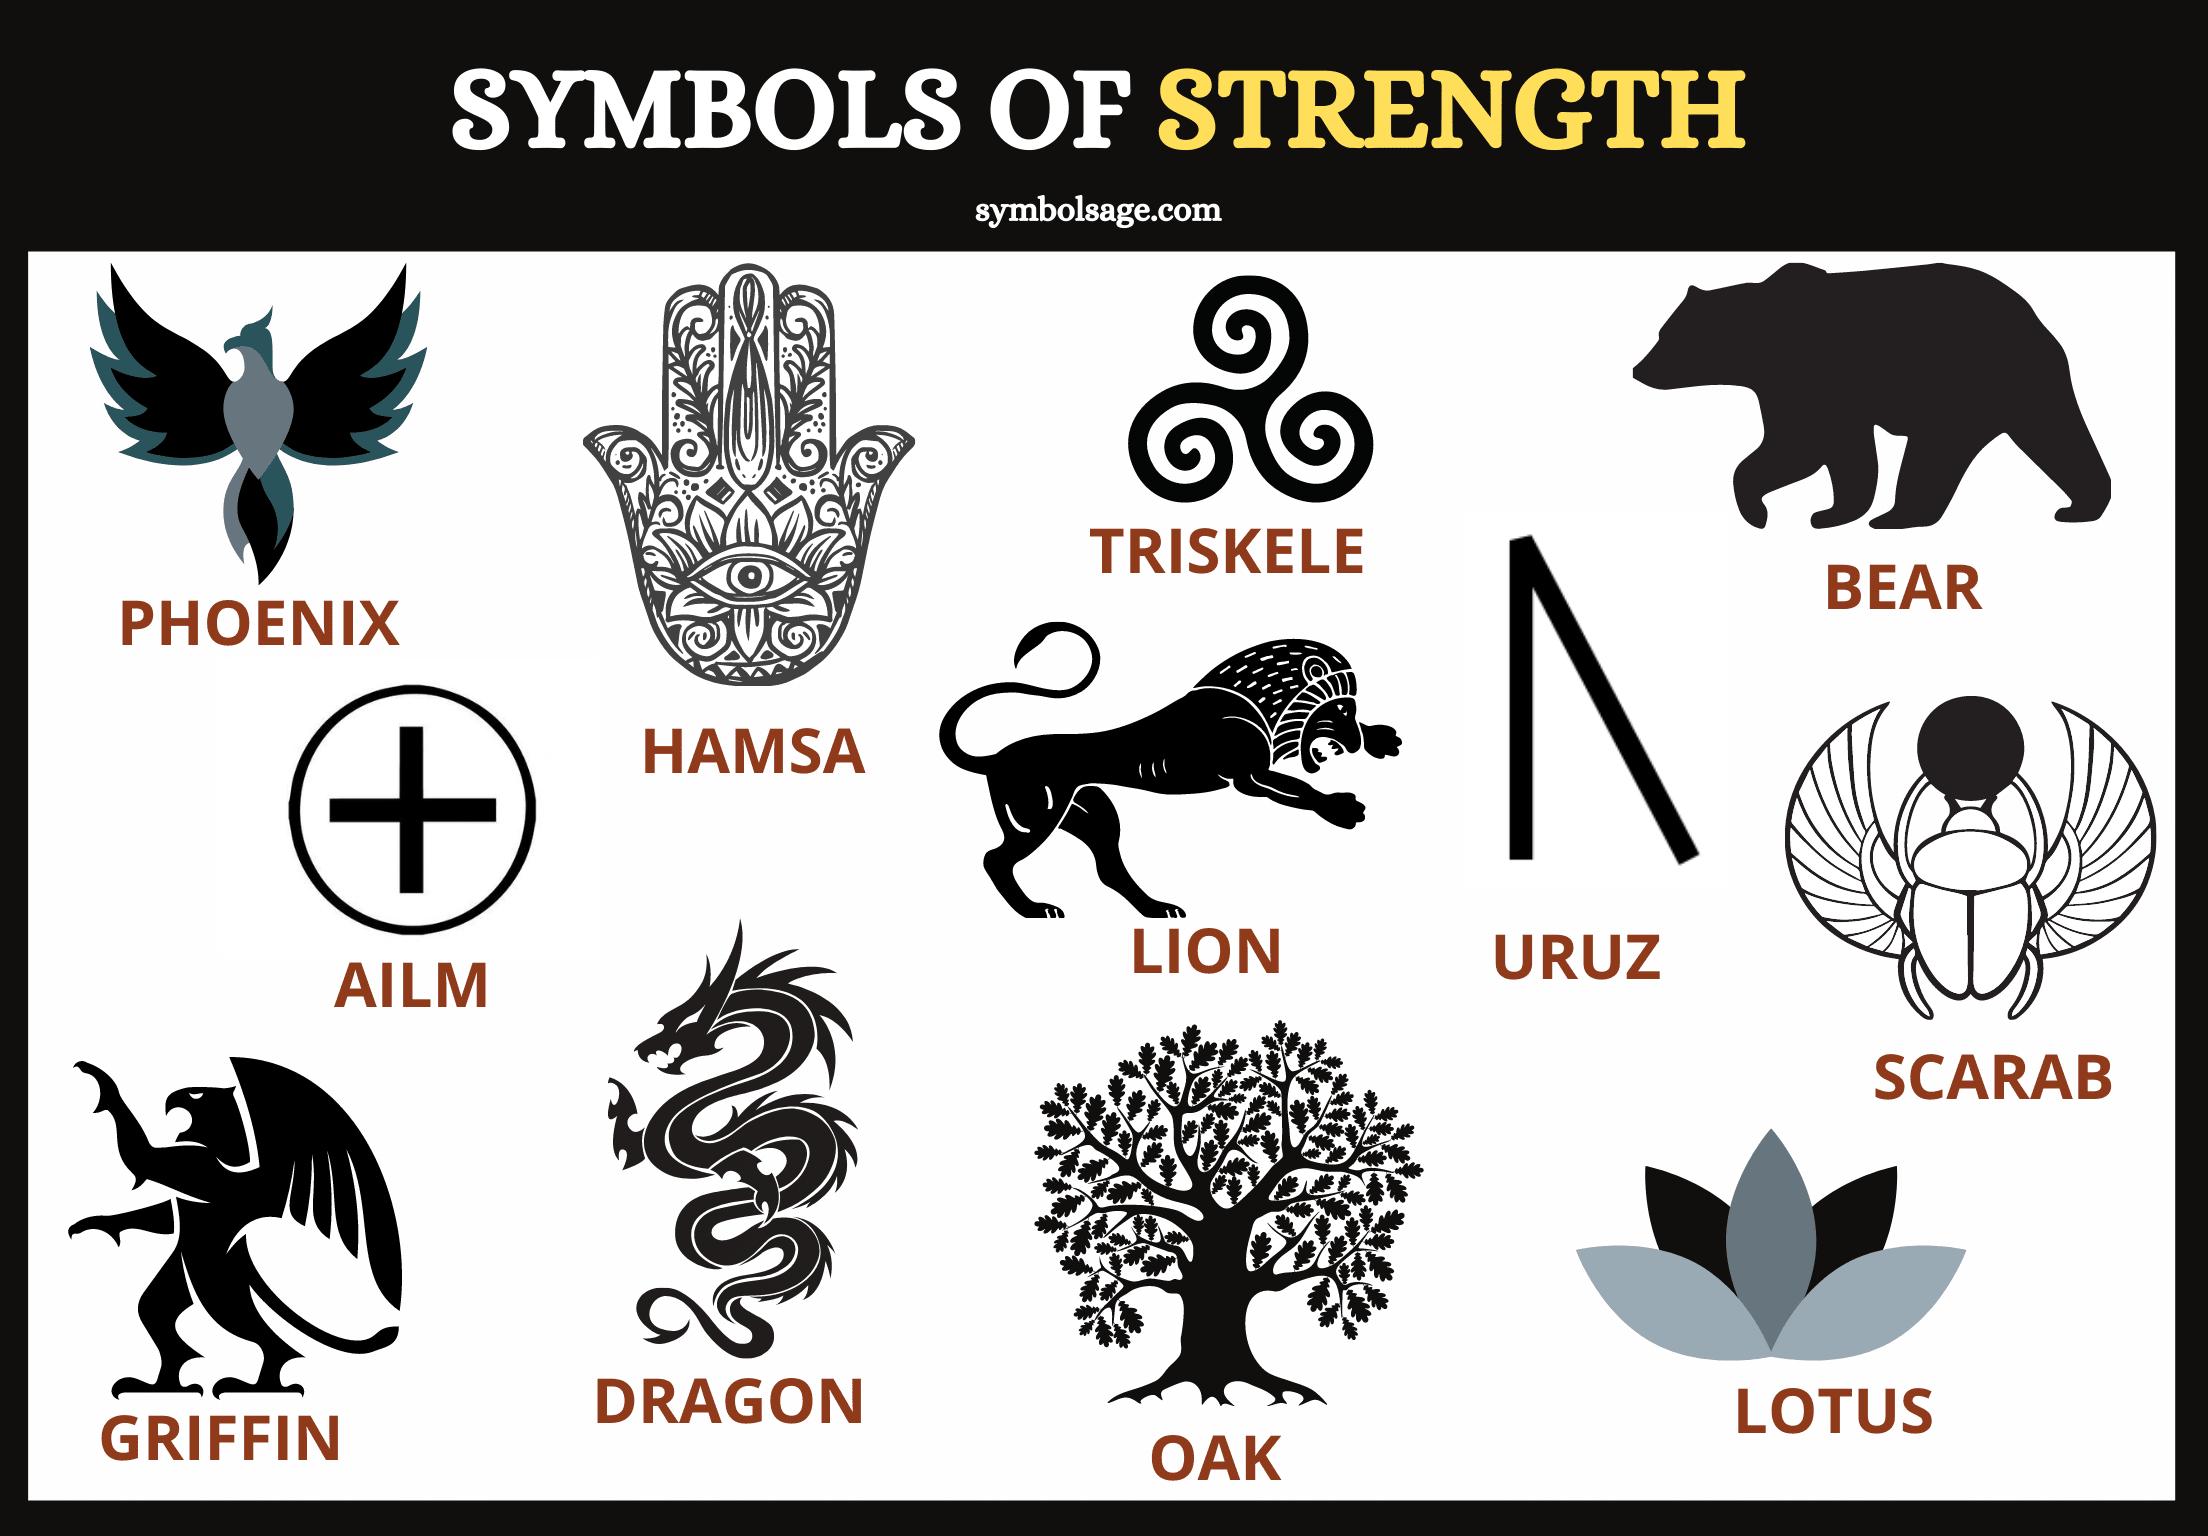 Symbols of strength list